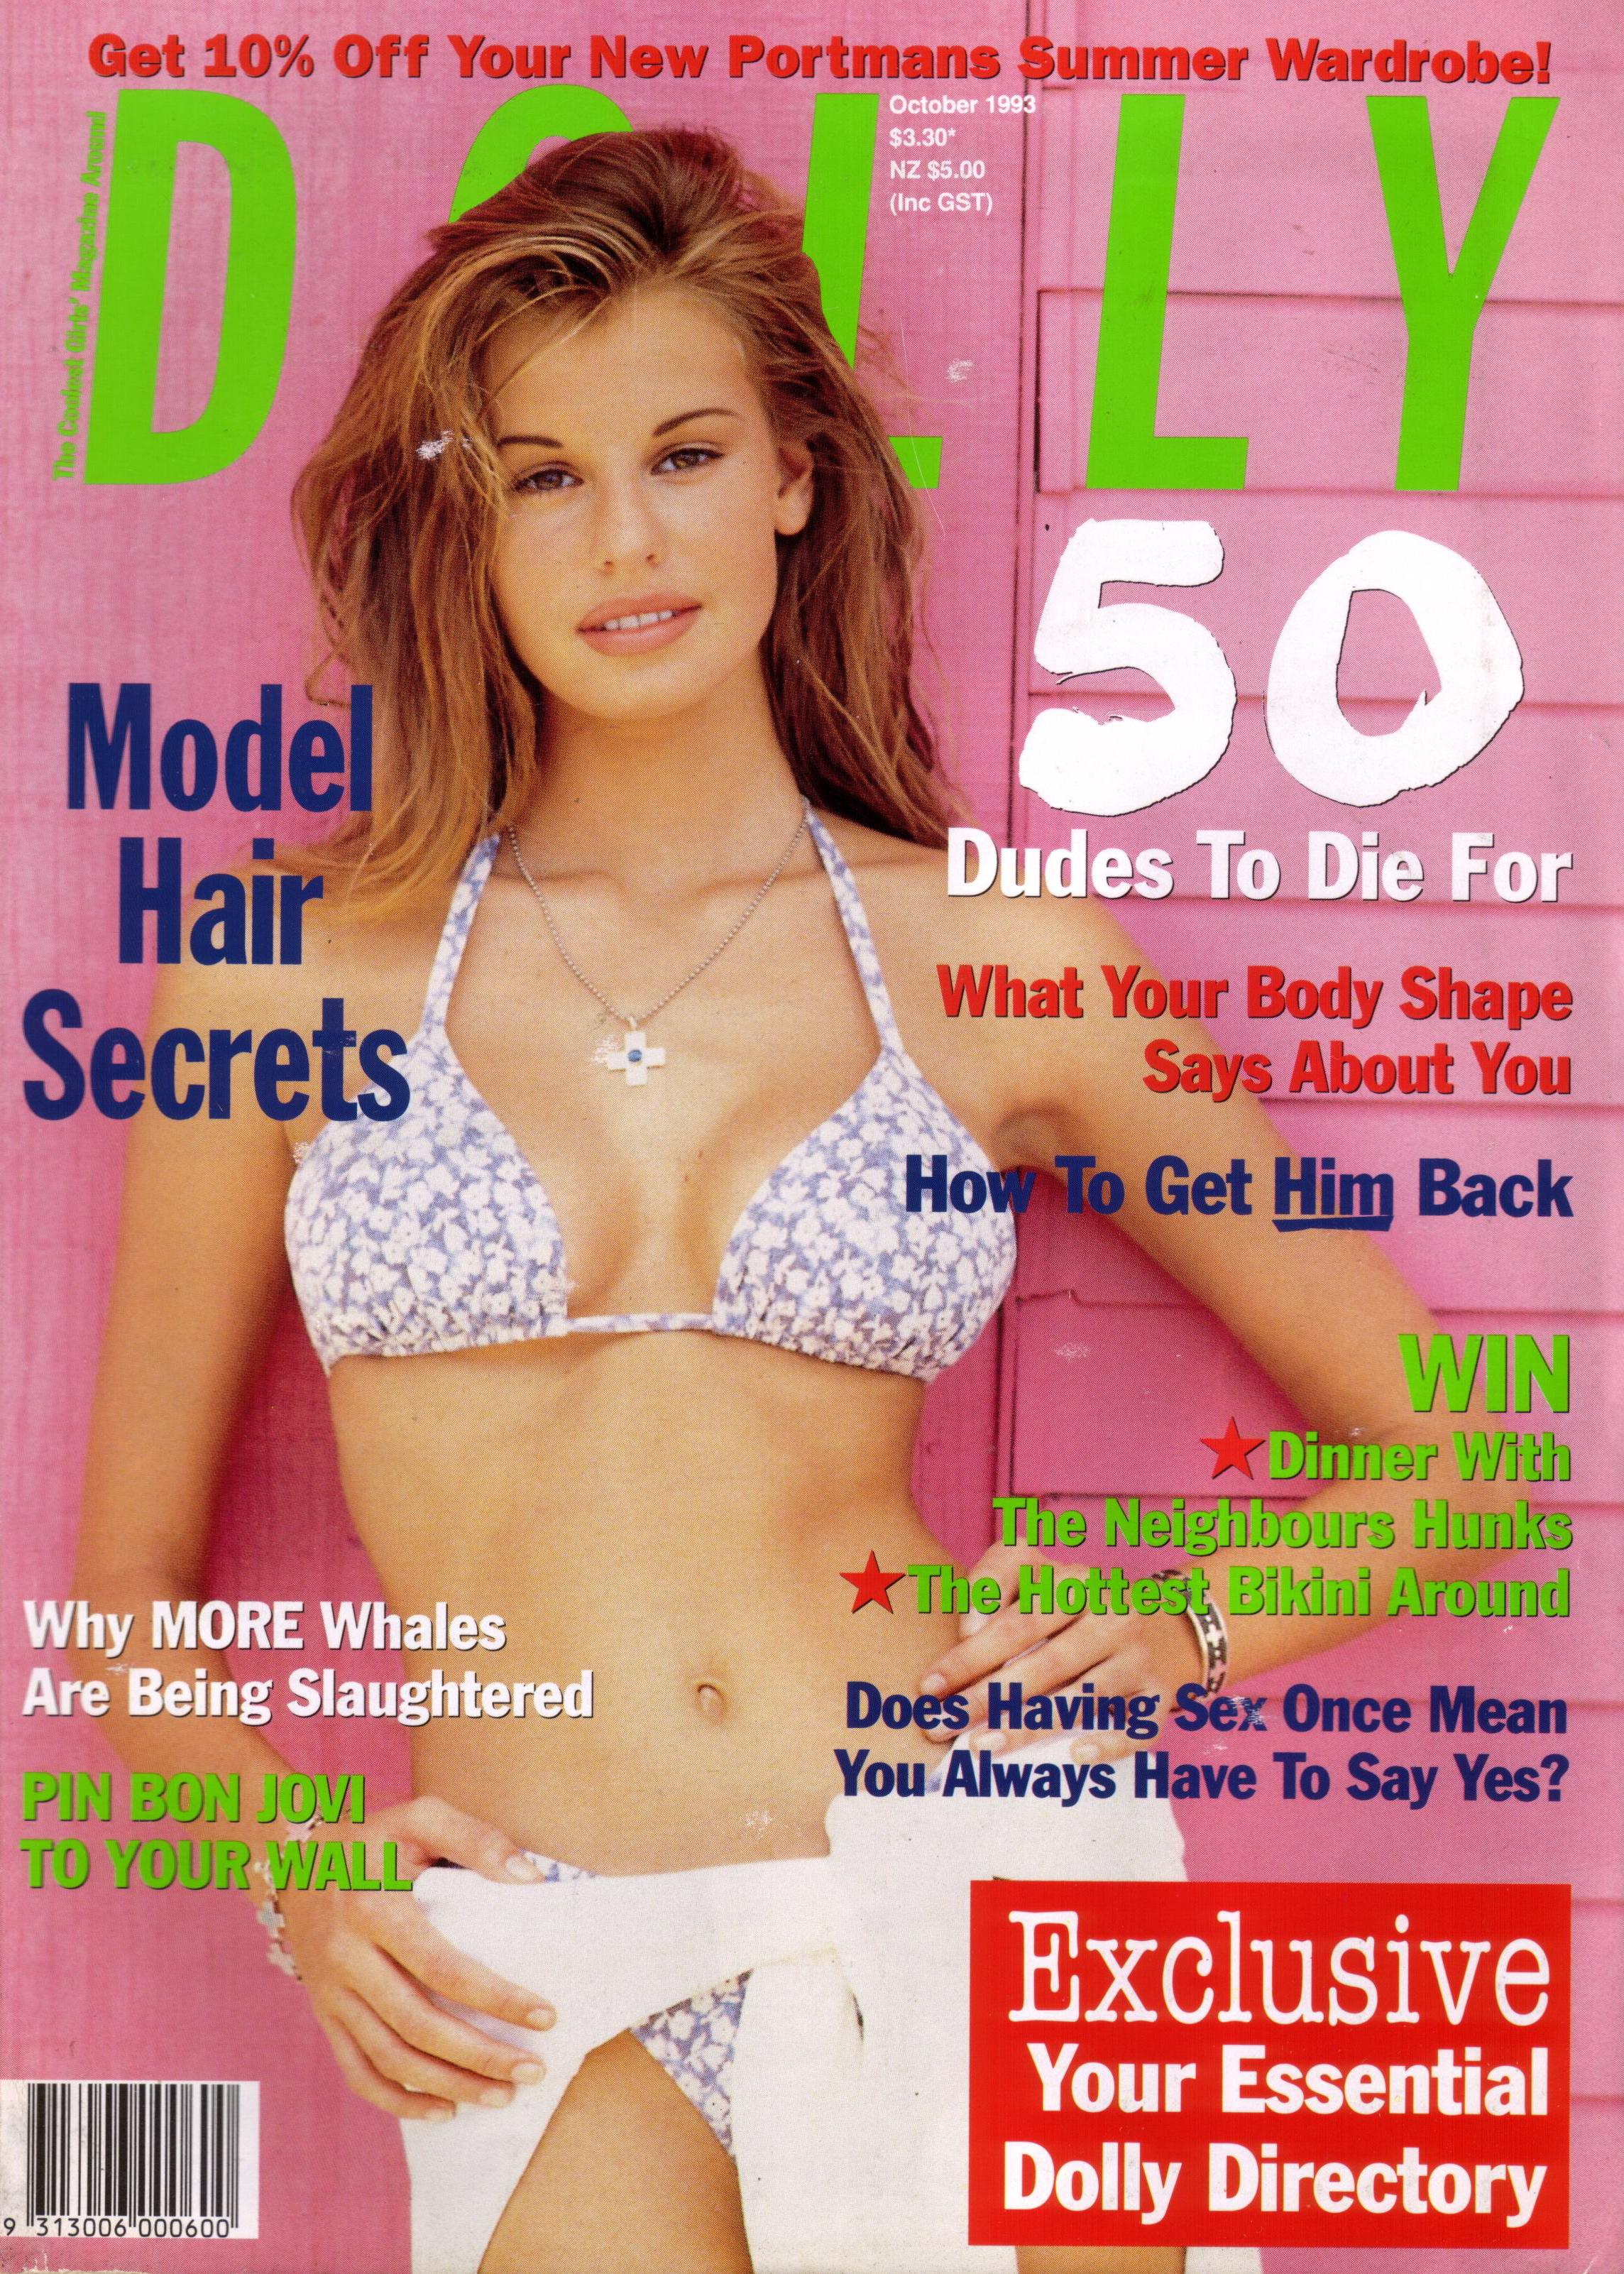 Dolly October 1993